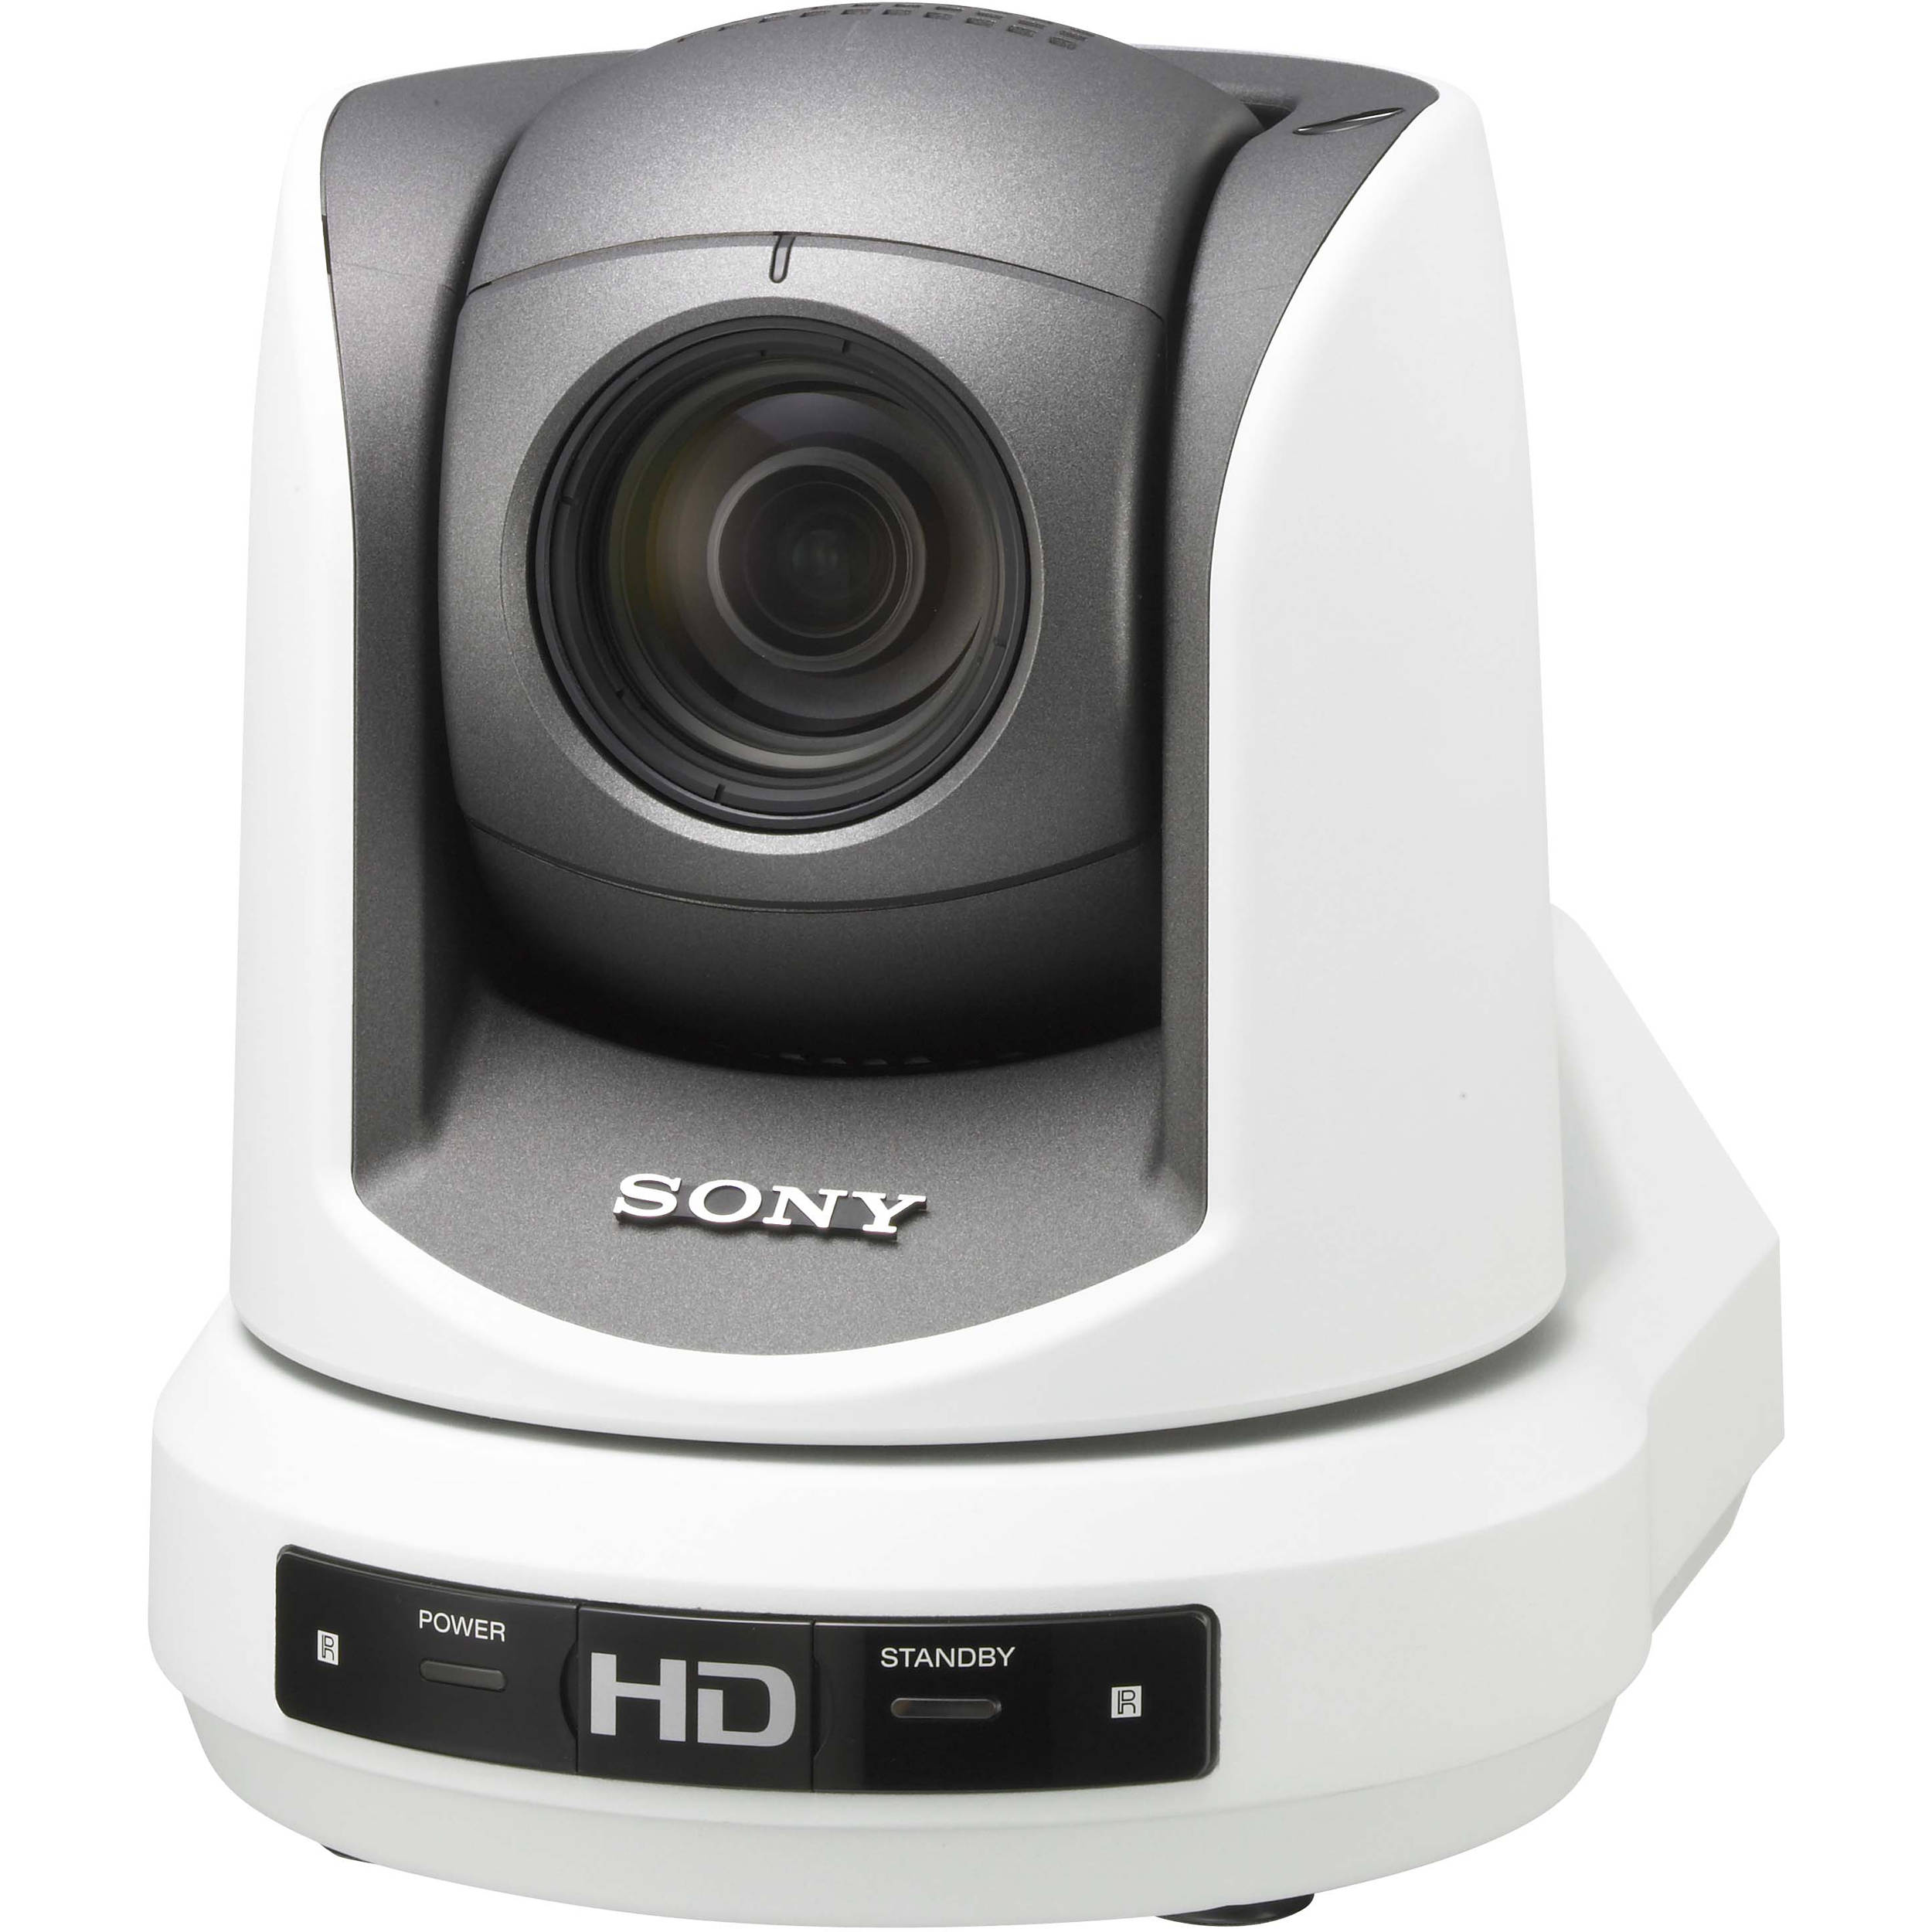 Sony Brc Z330 High Definition Ptz Camera Brcz330 C B Amp H Photo